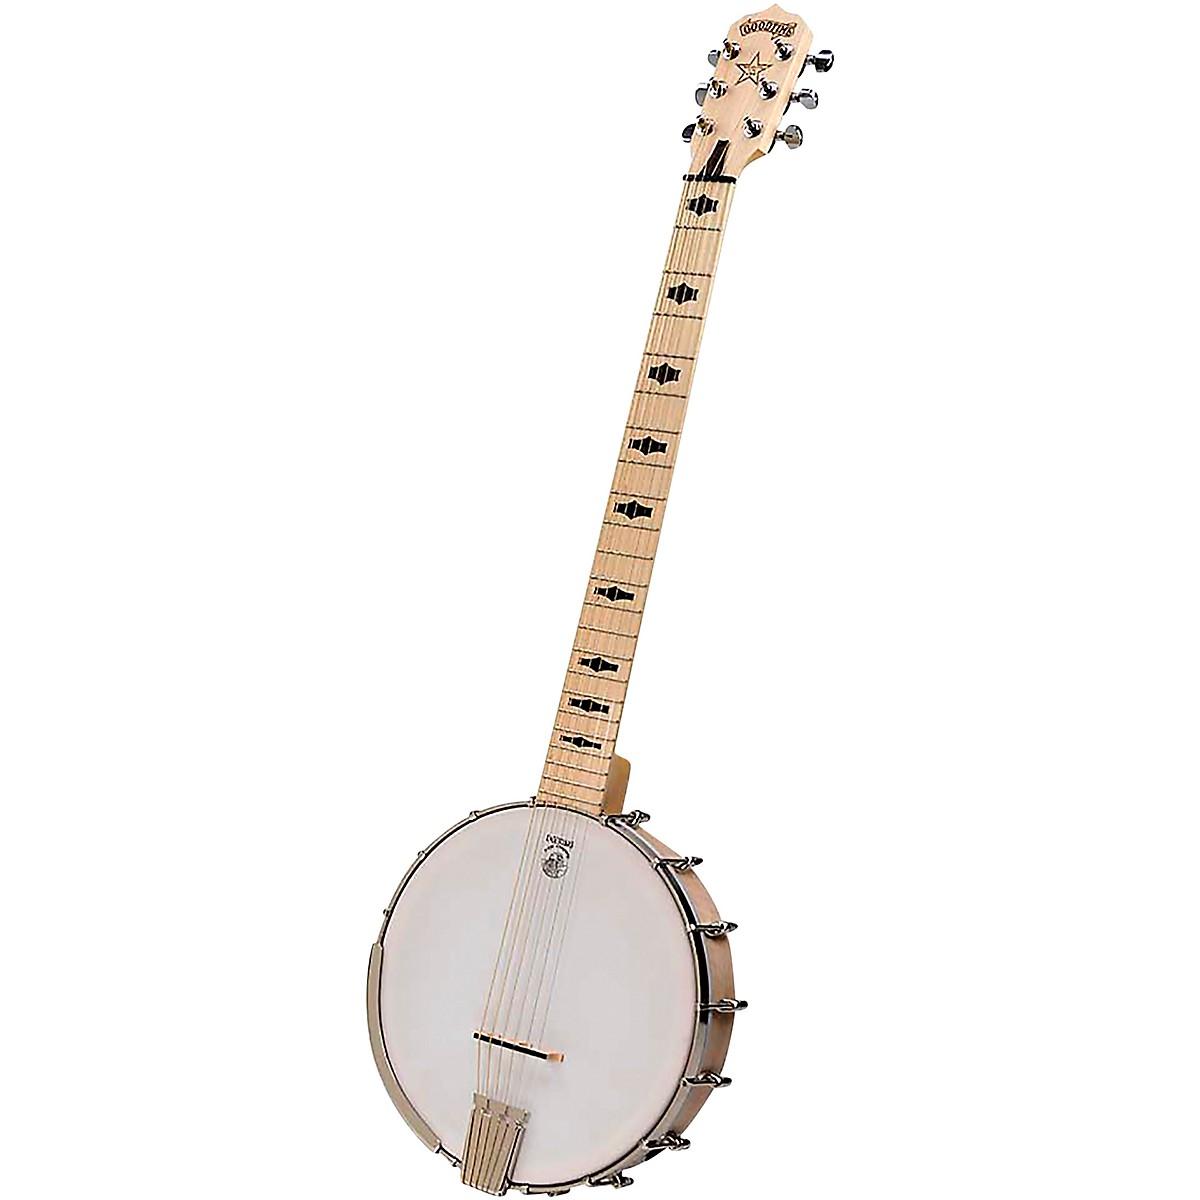 Deering Goodtime 6- String Banjo